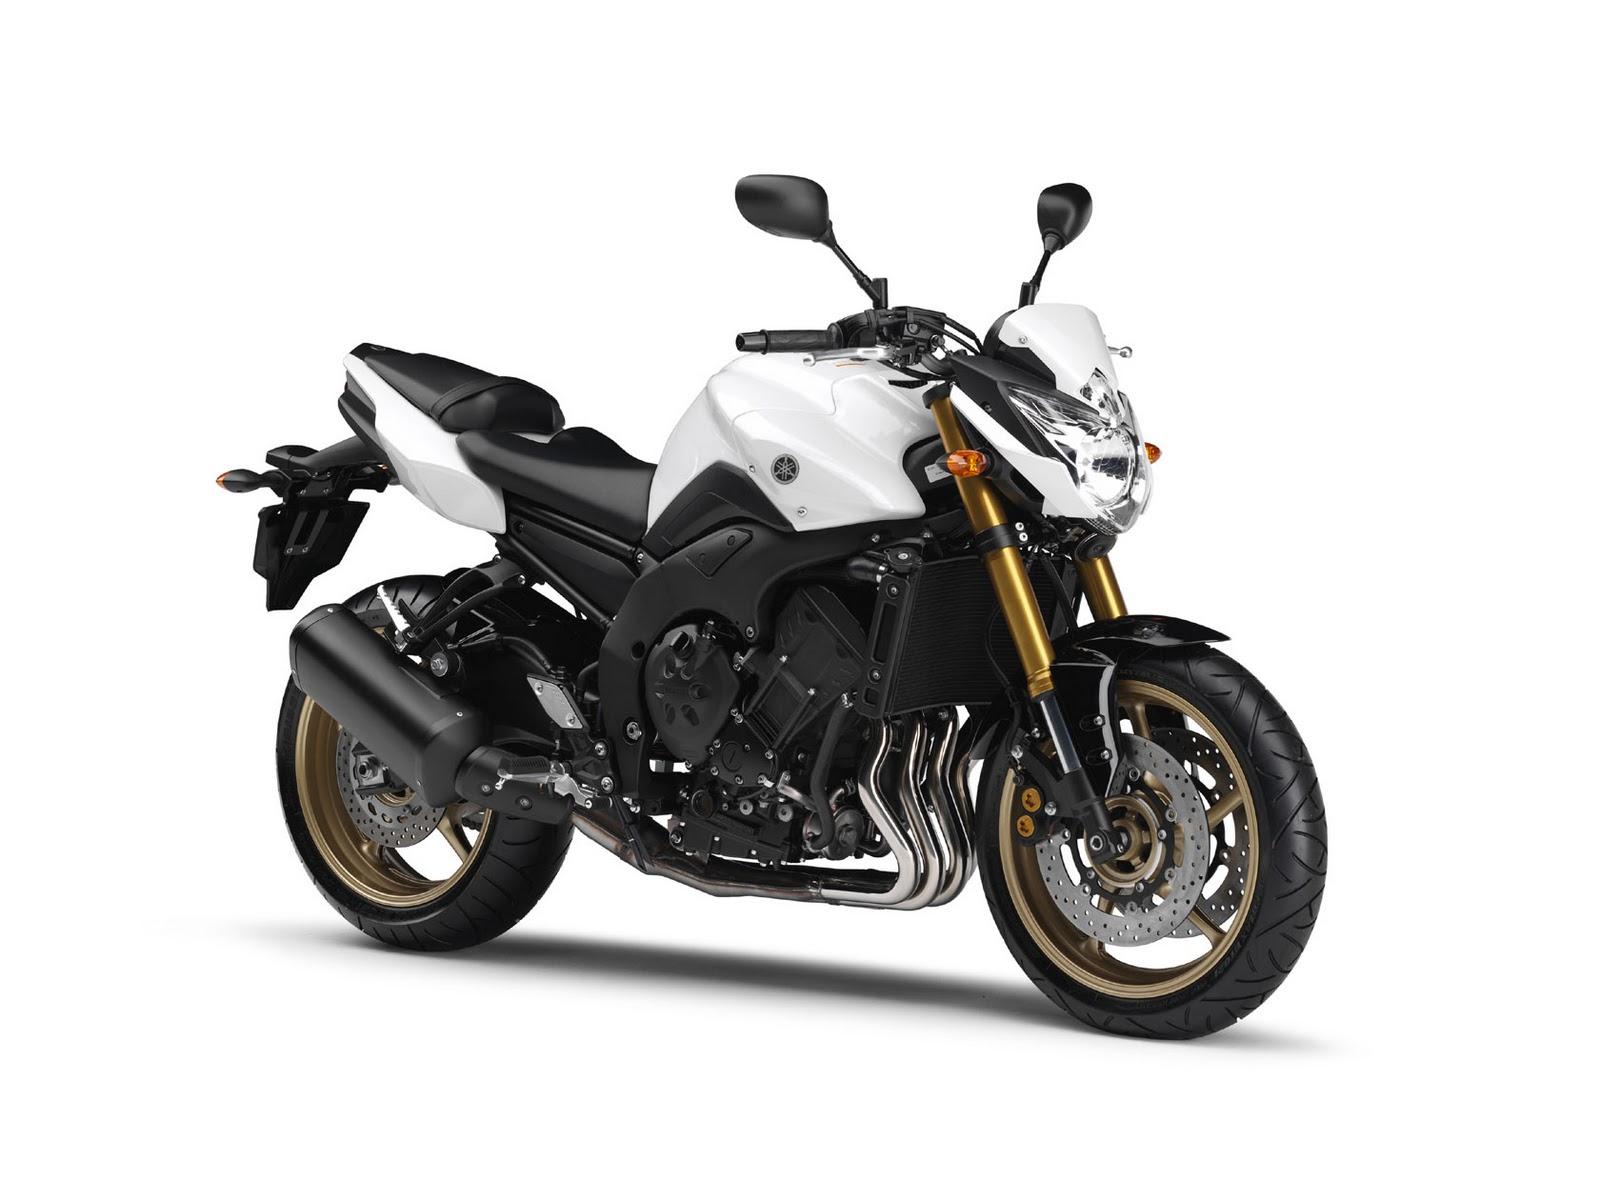 Yamaha Fz Motorcycle